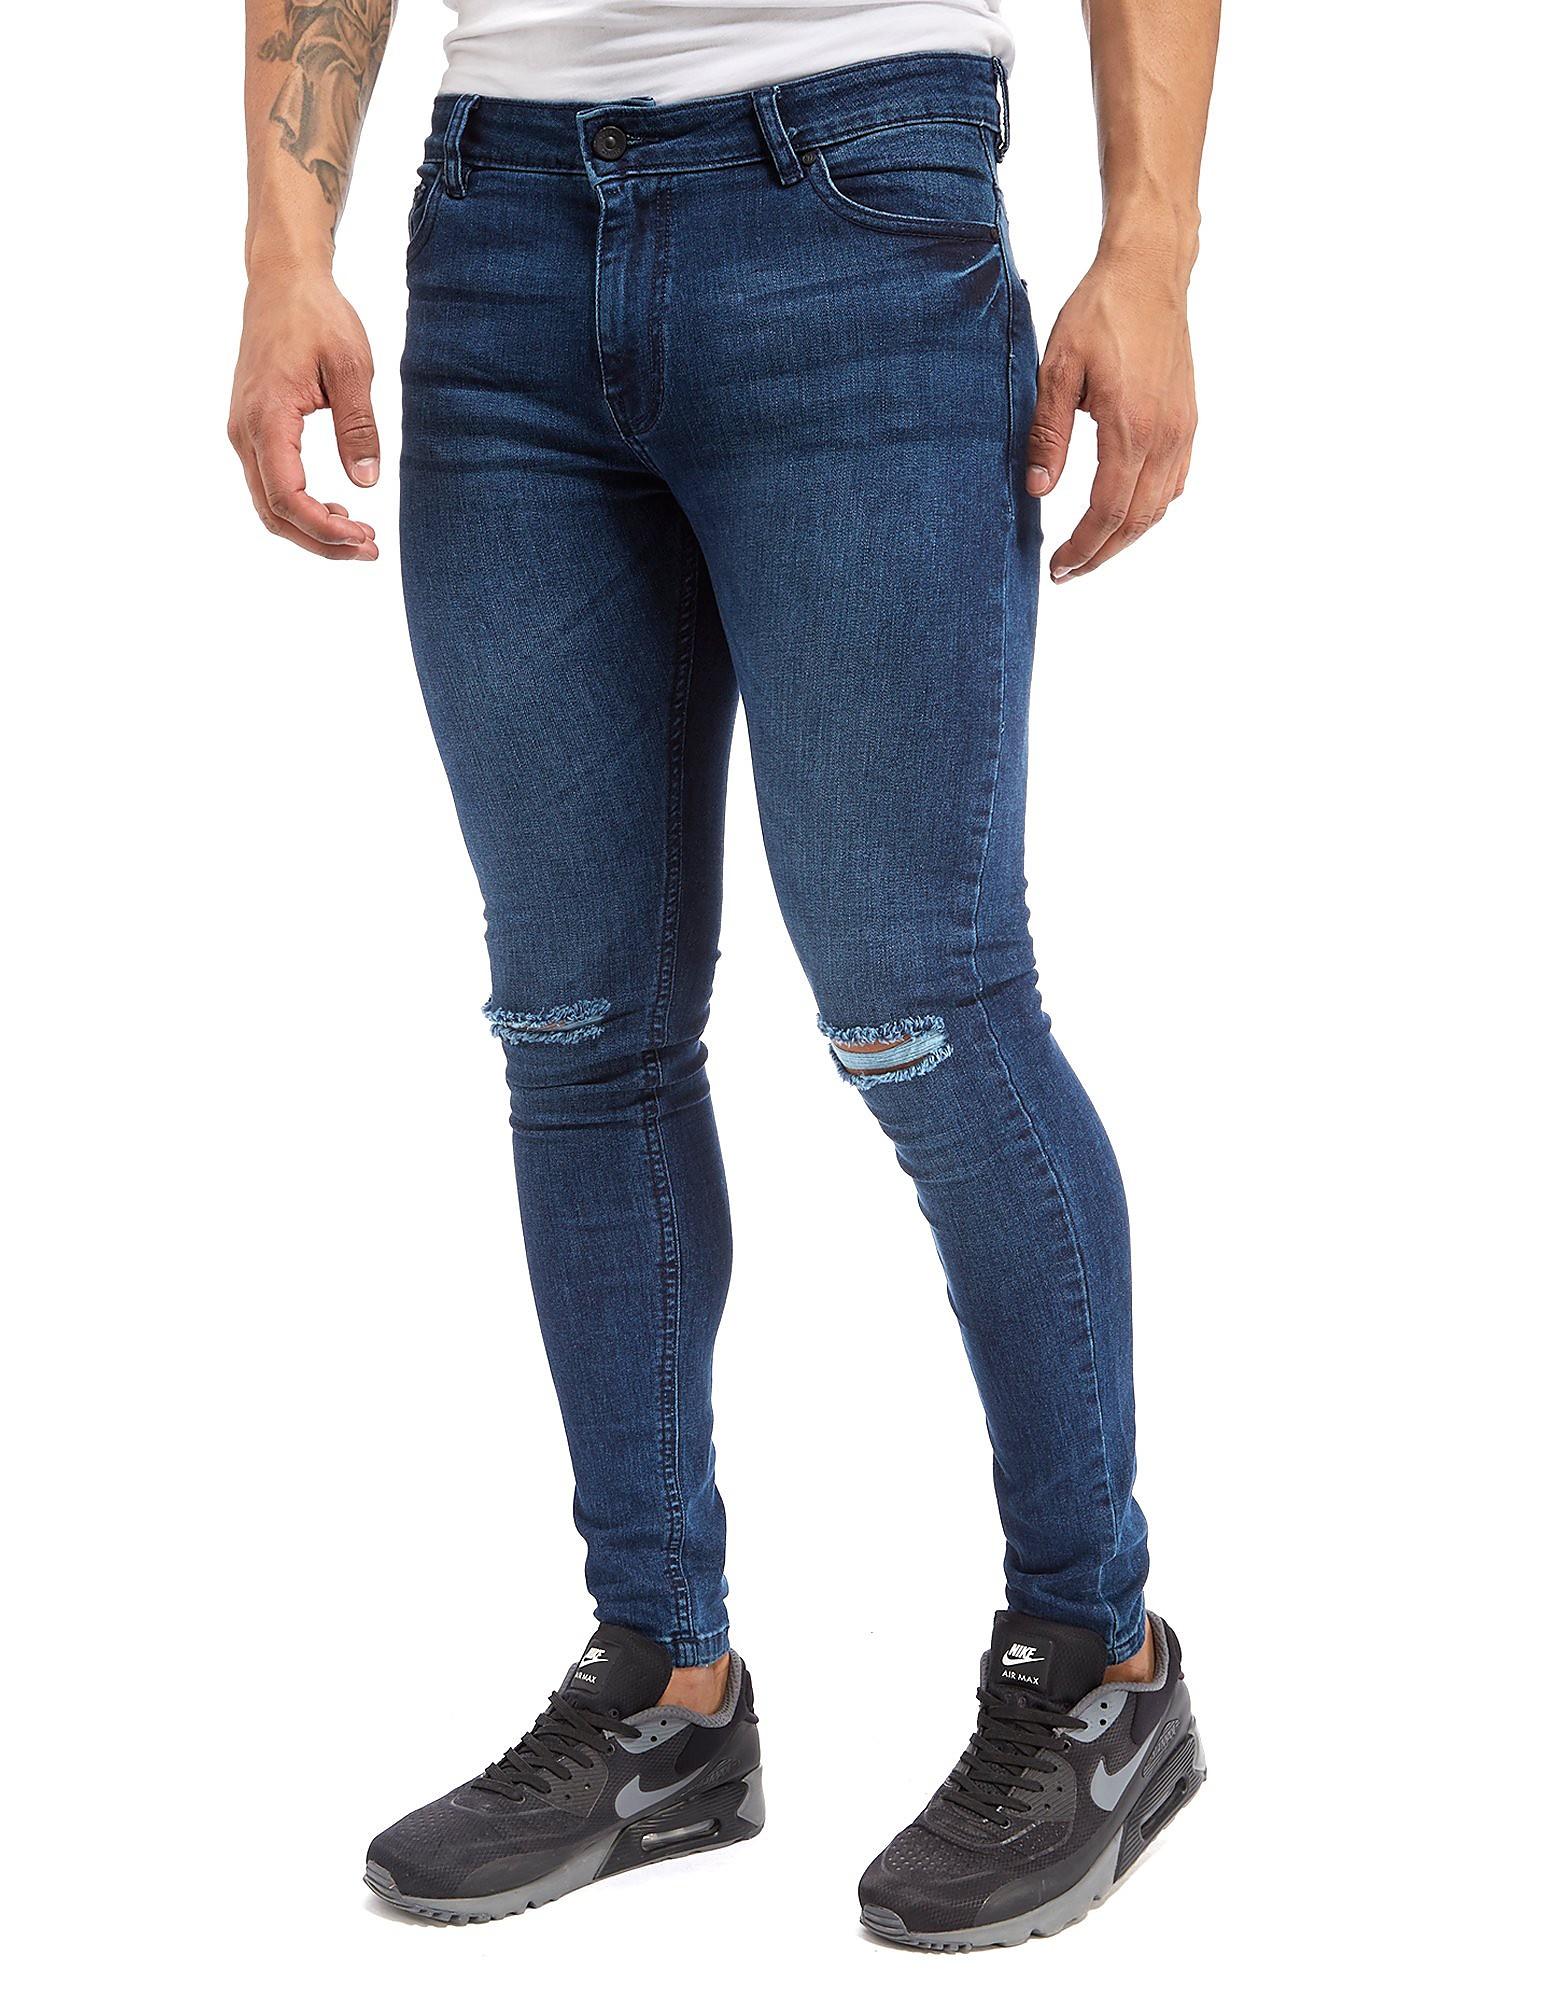 Supply & Demand Skyline Jeans